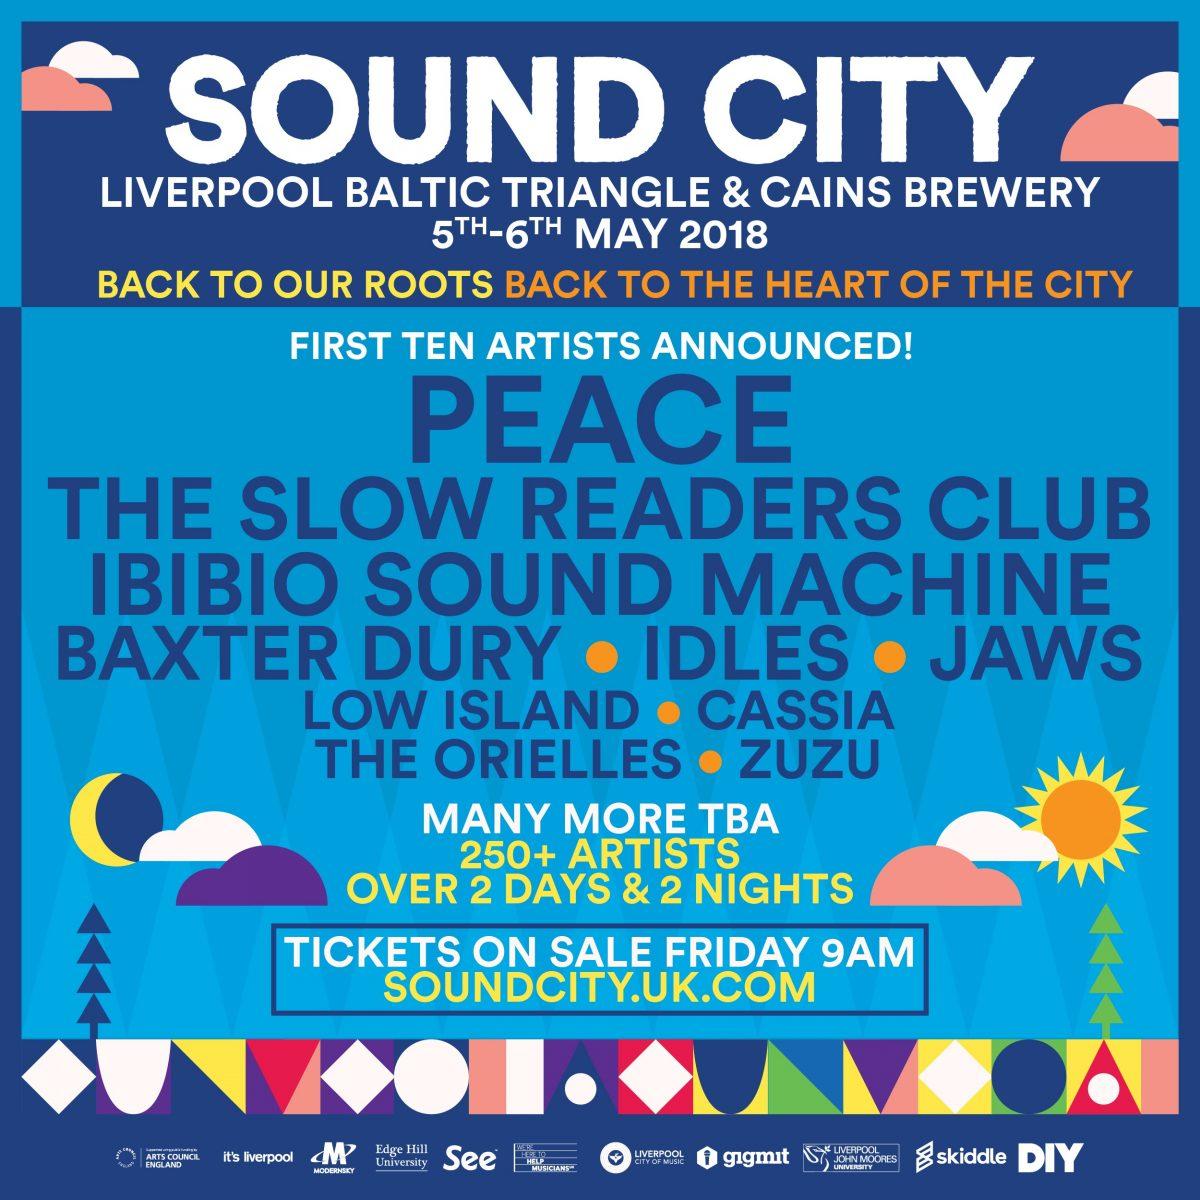 Sound City 2018